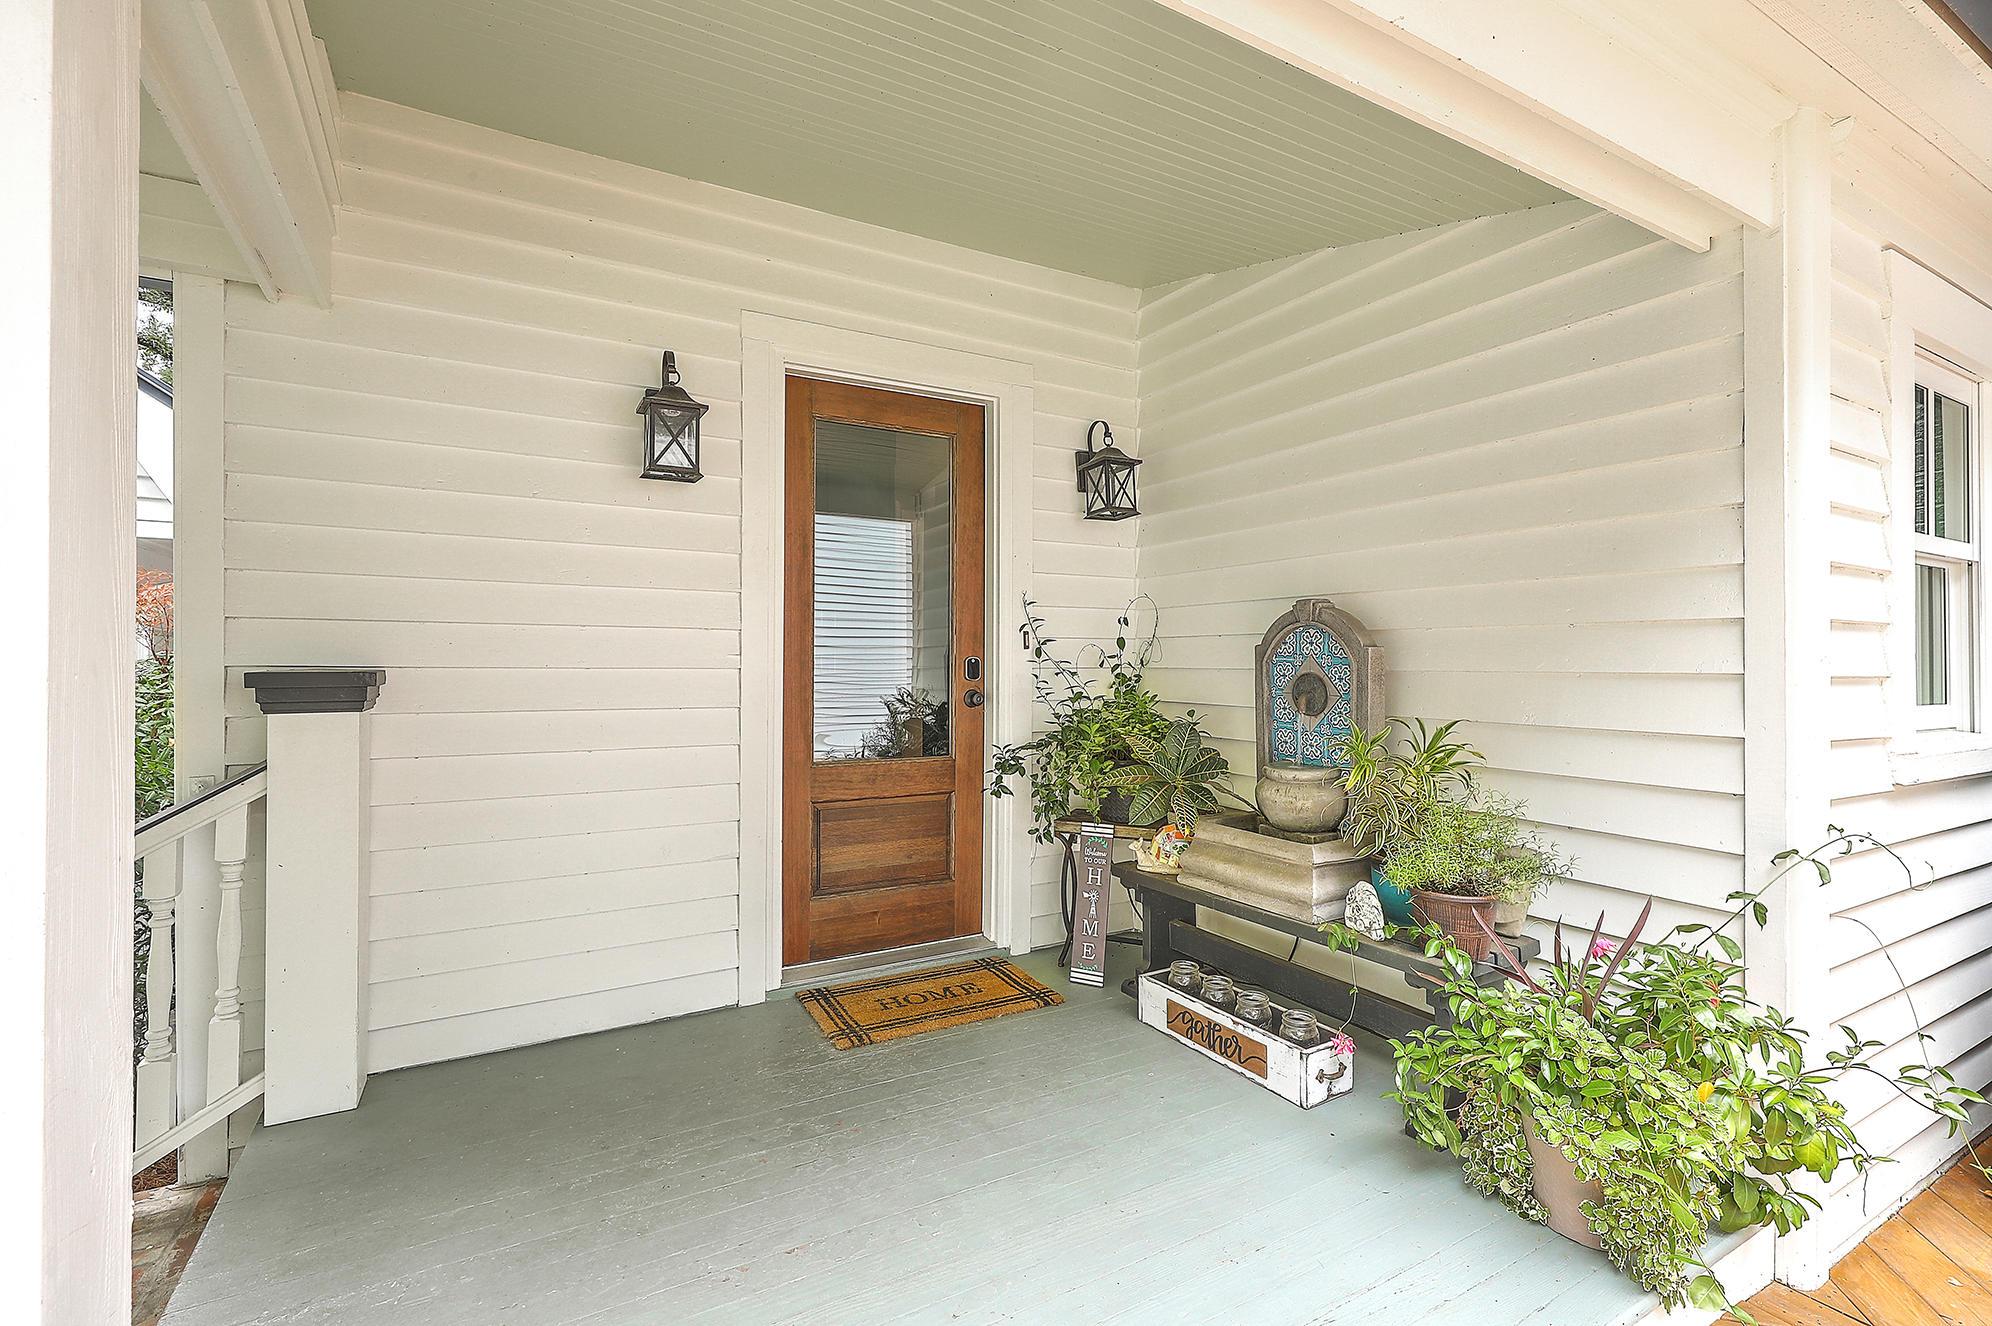 Summerville Homes For Sale - 102 Hickory, Summerville, SC - 85